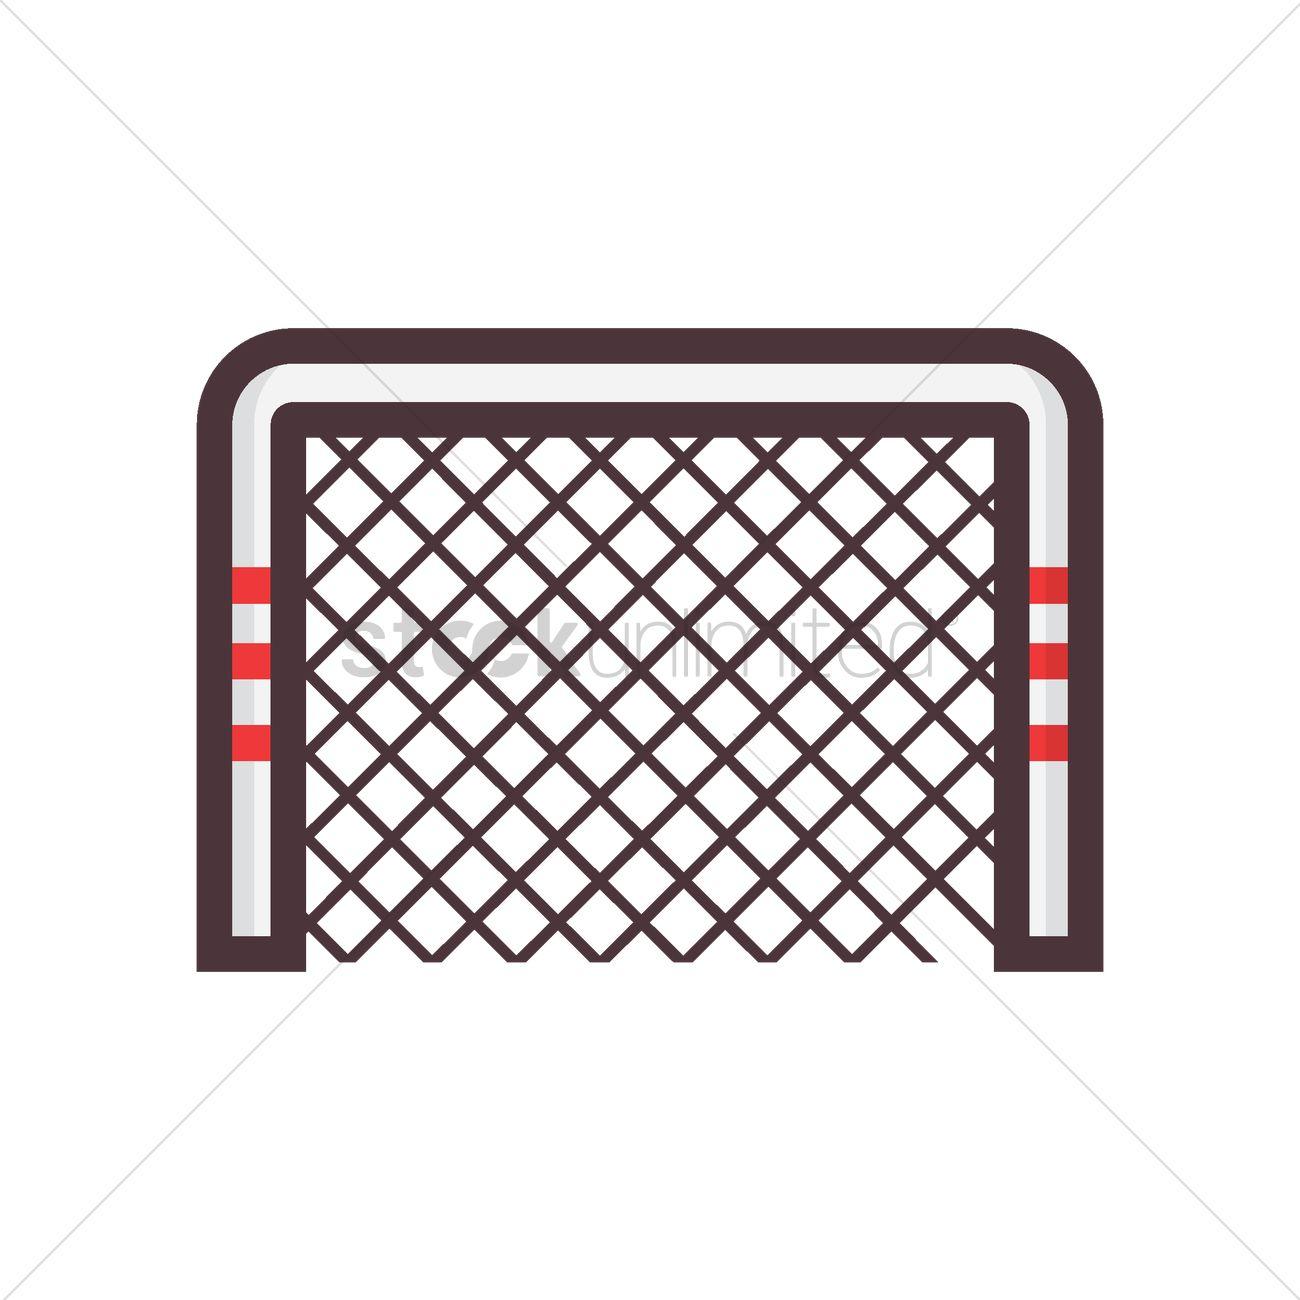 1300x1300 Hockey Goal Vector Image